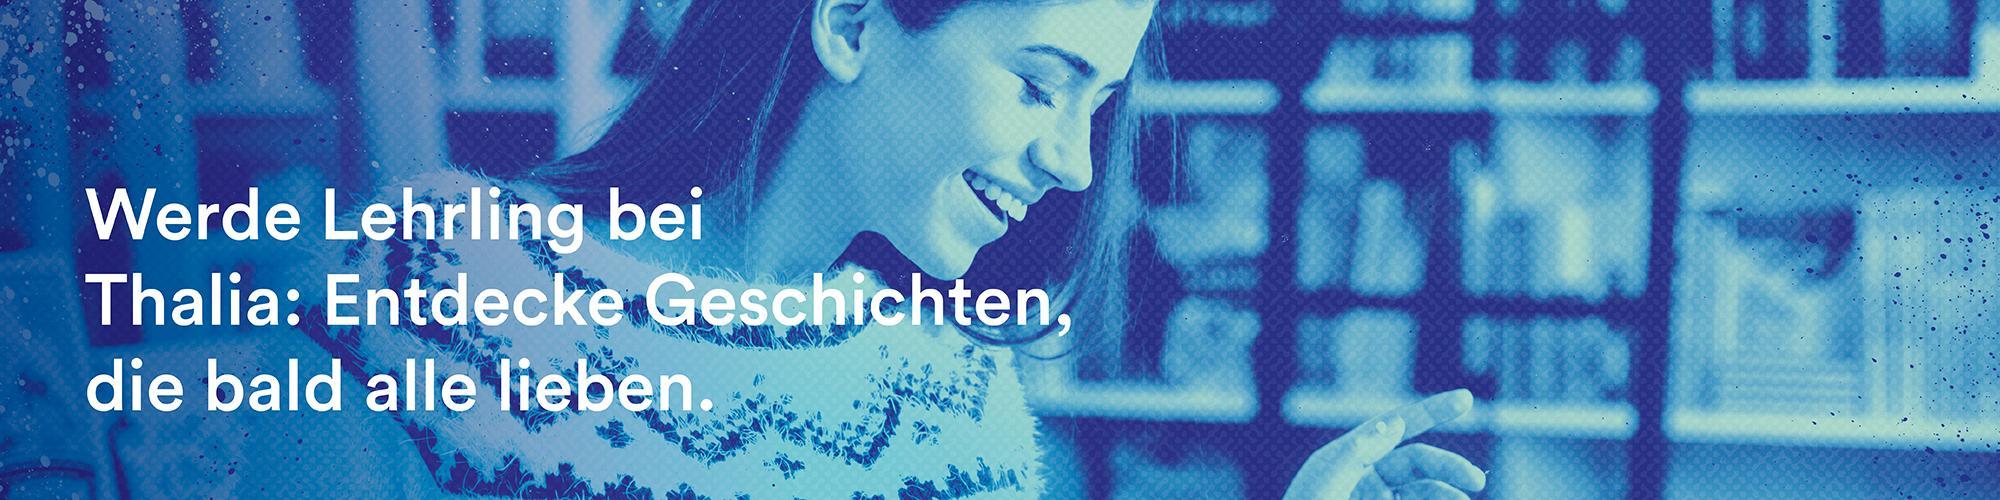 Thalia Buch & Medien GmbH